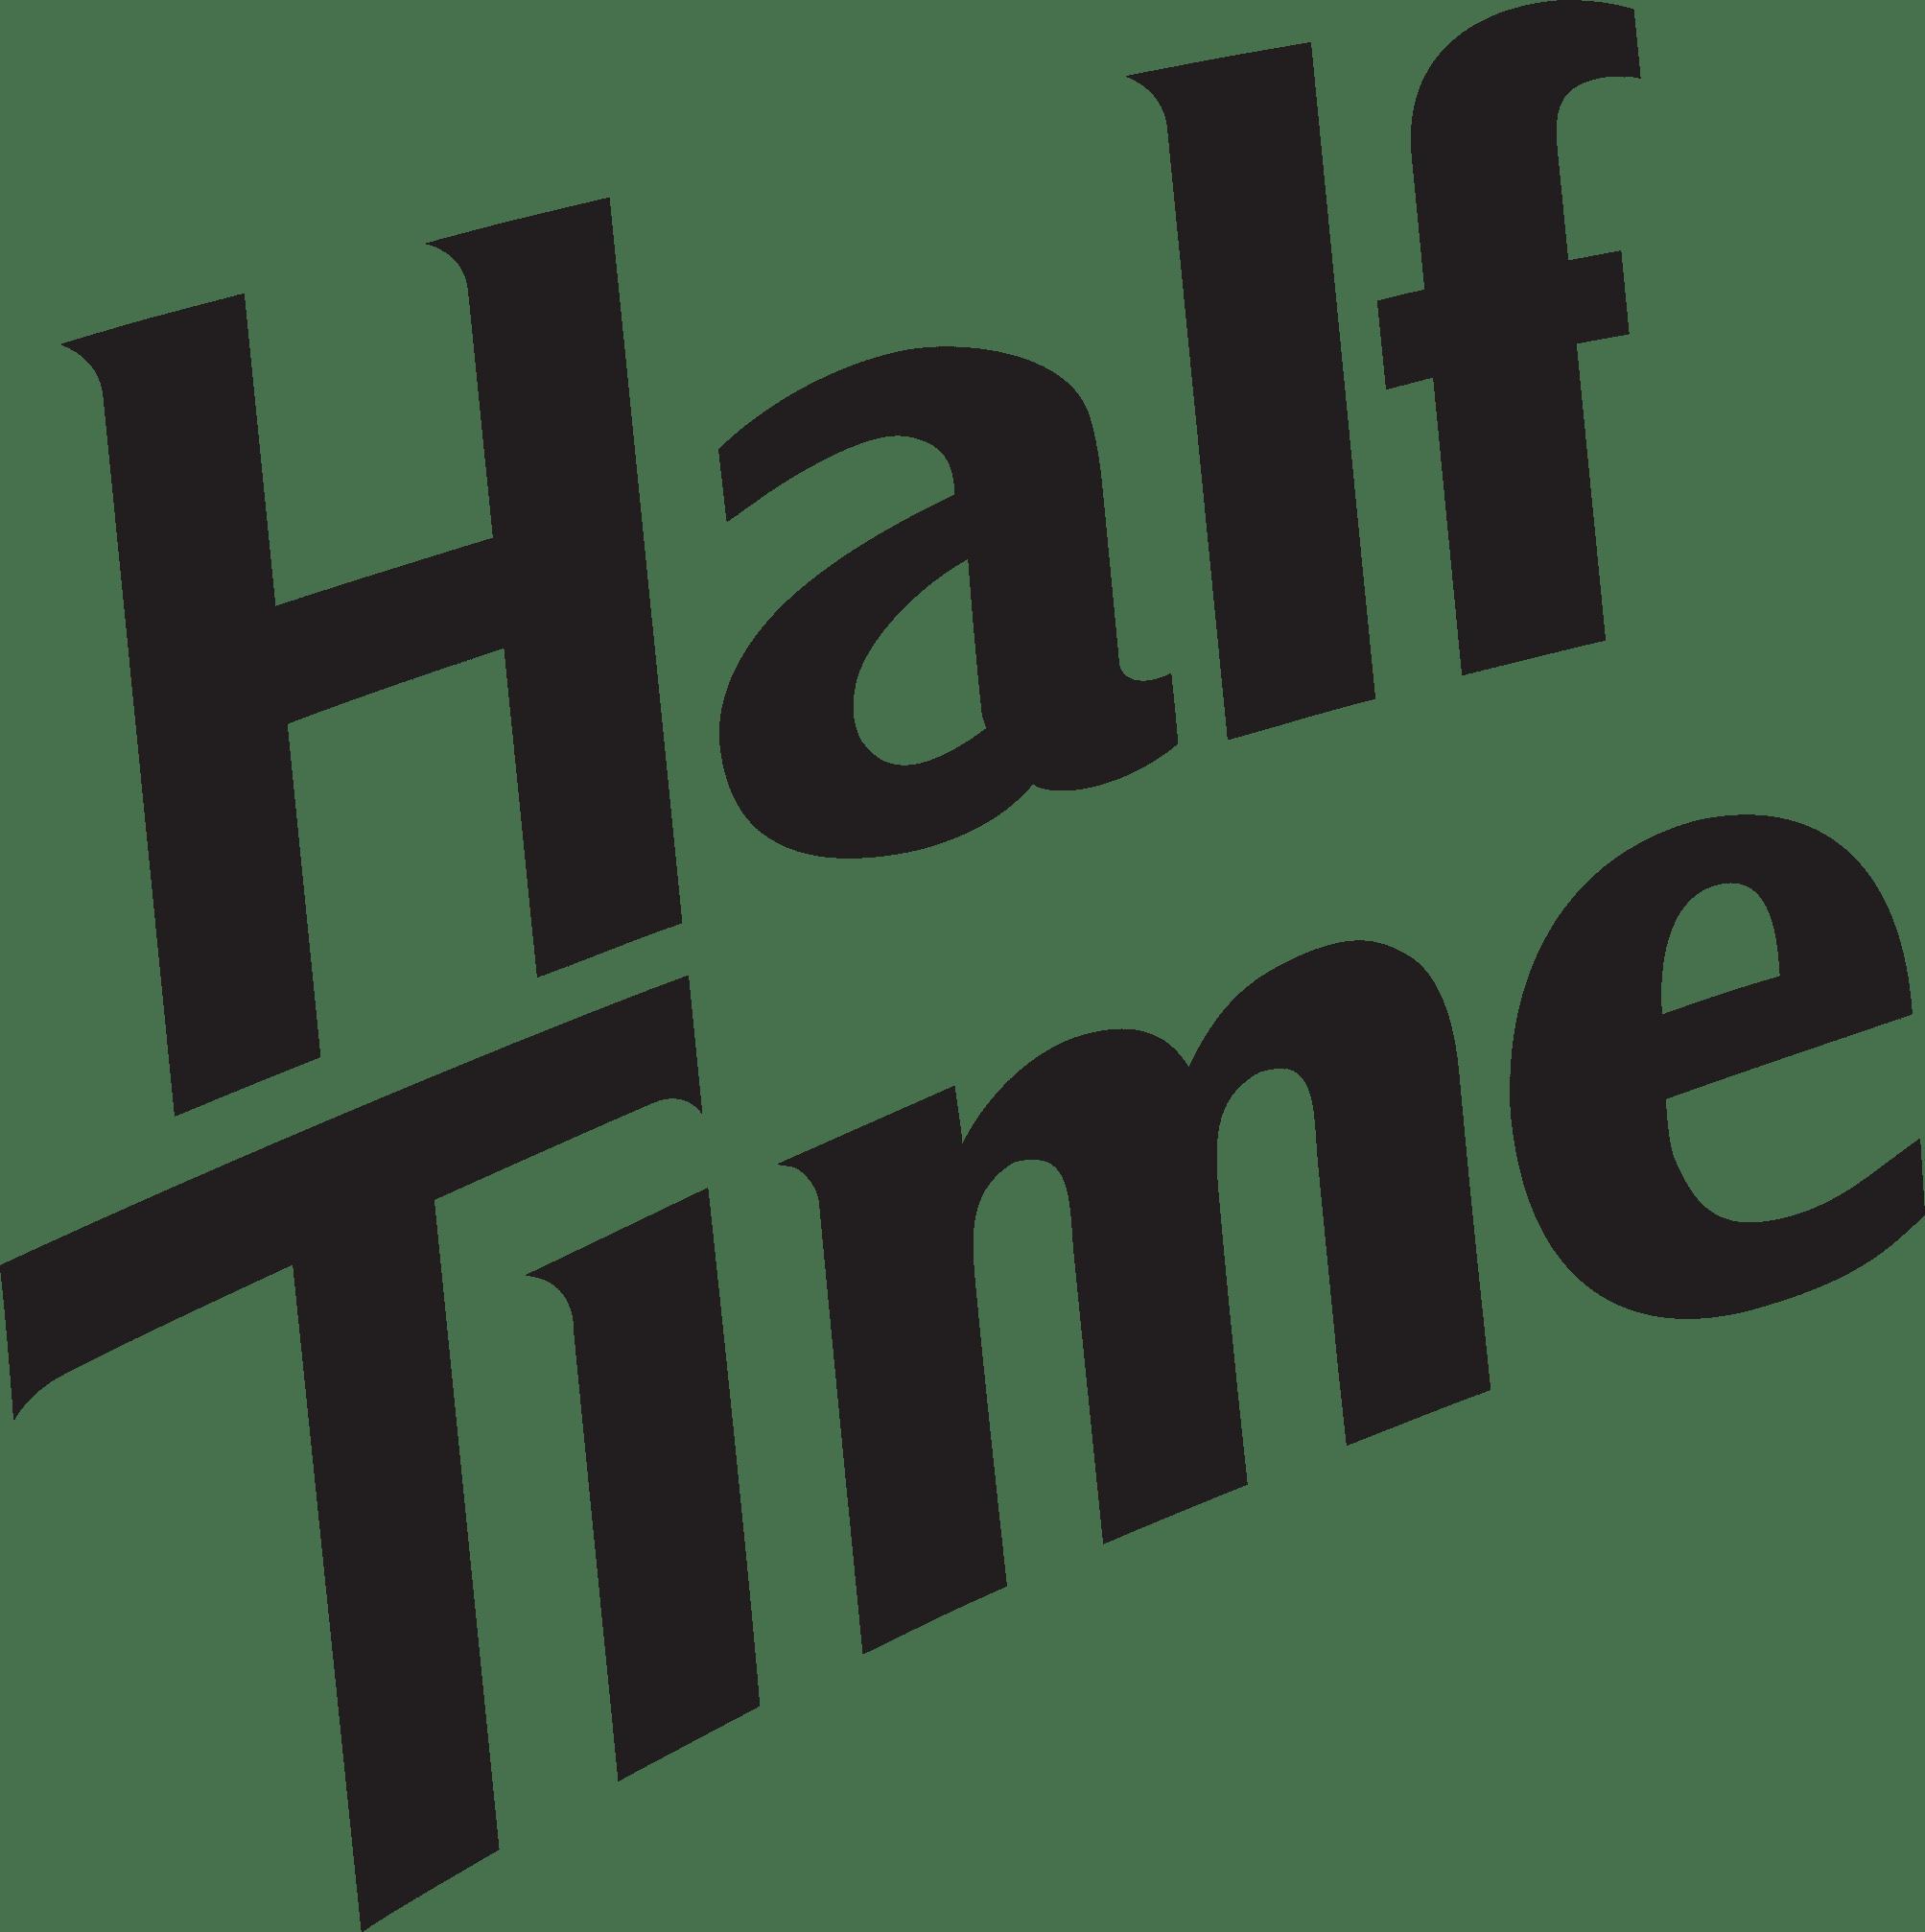 Half Time logo 2020 BLACK